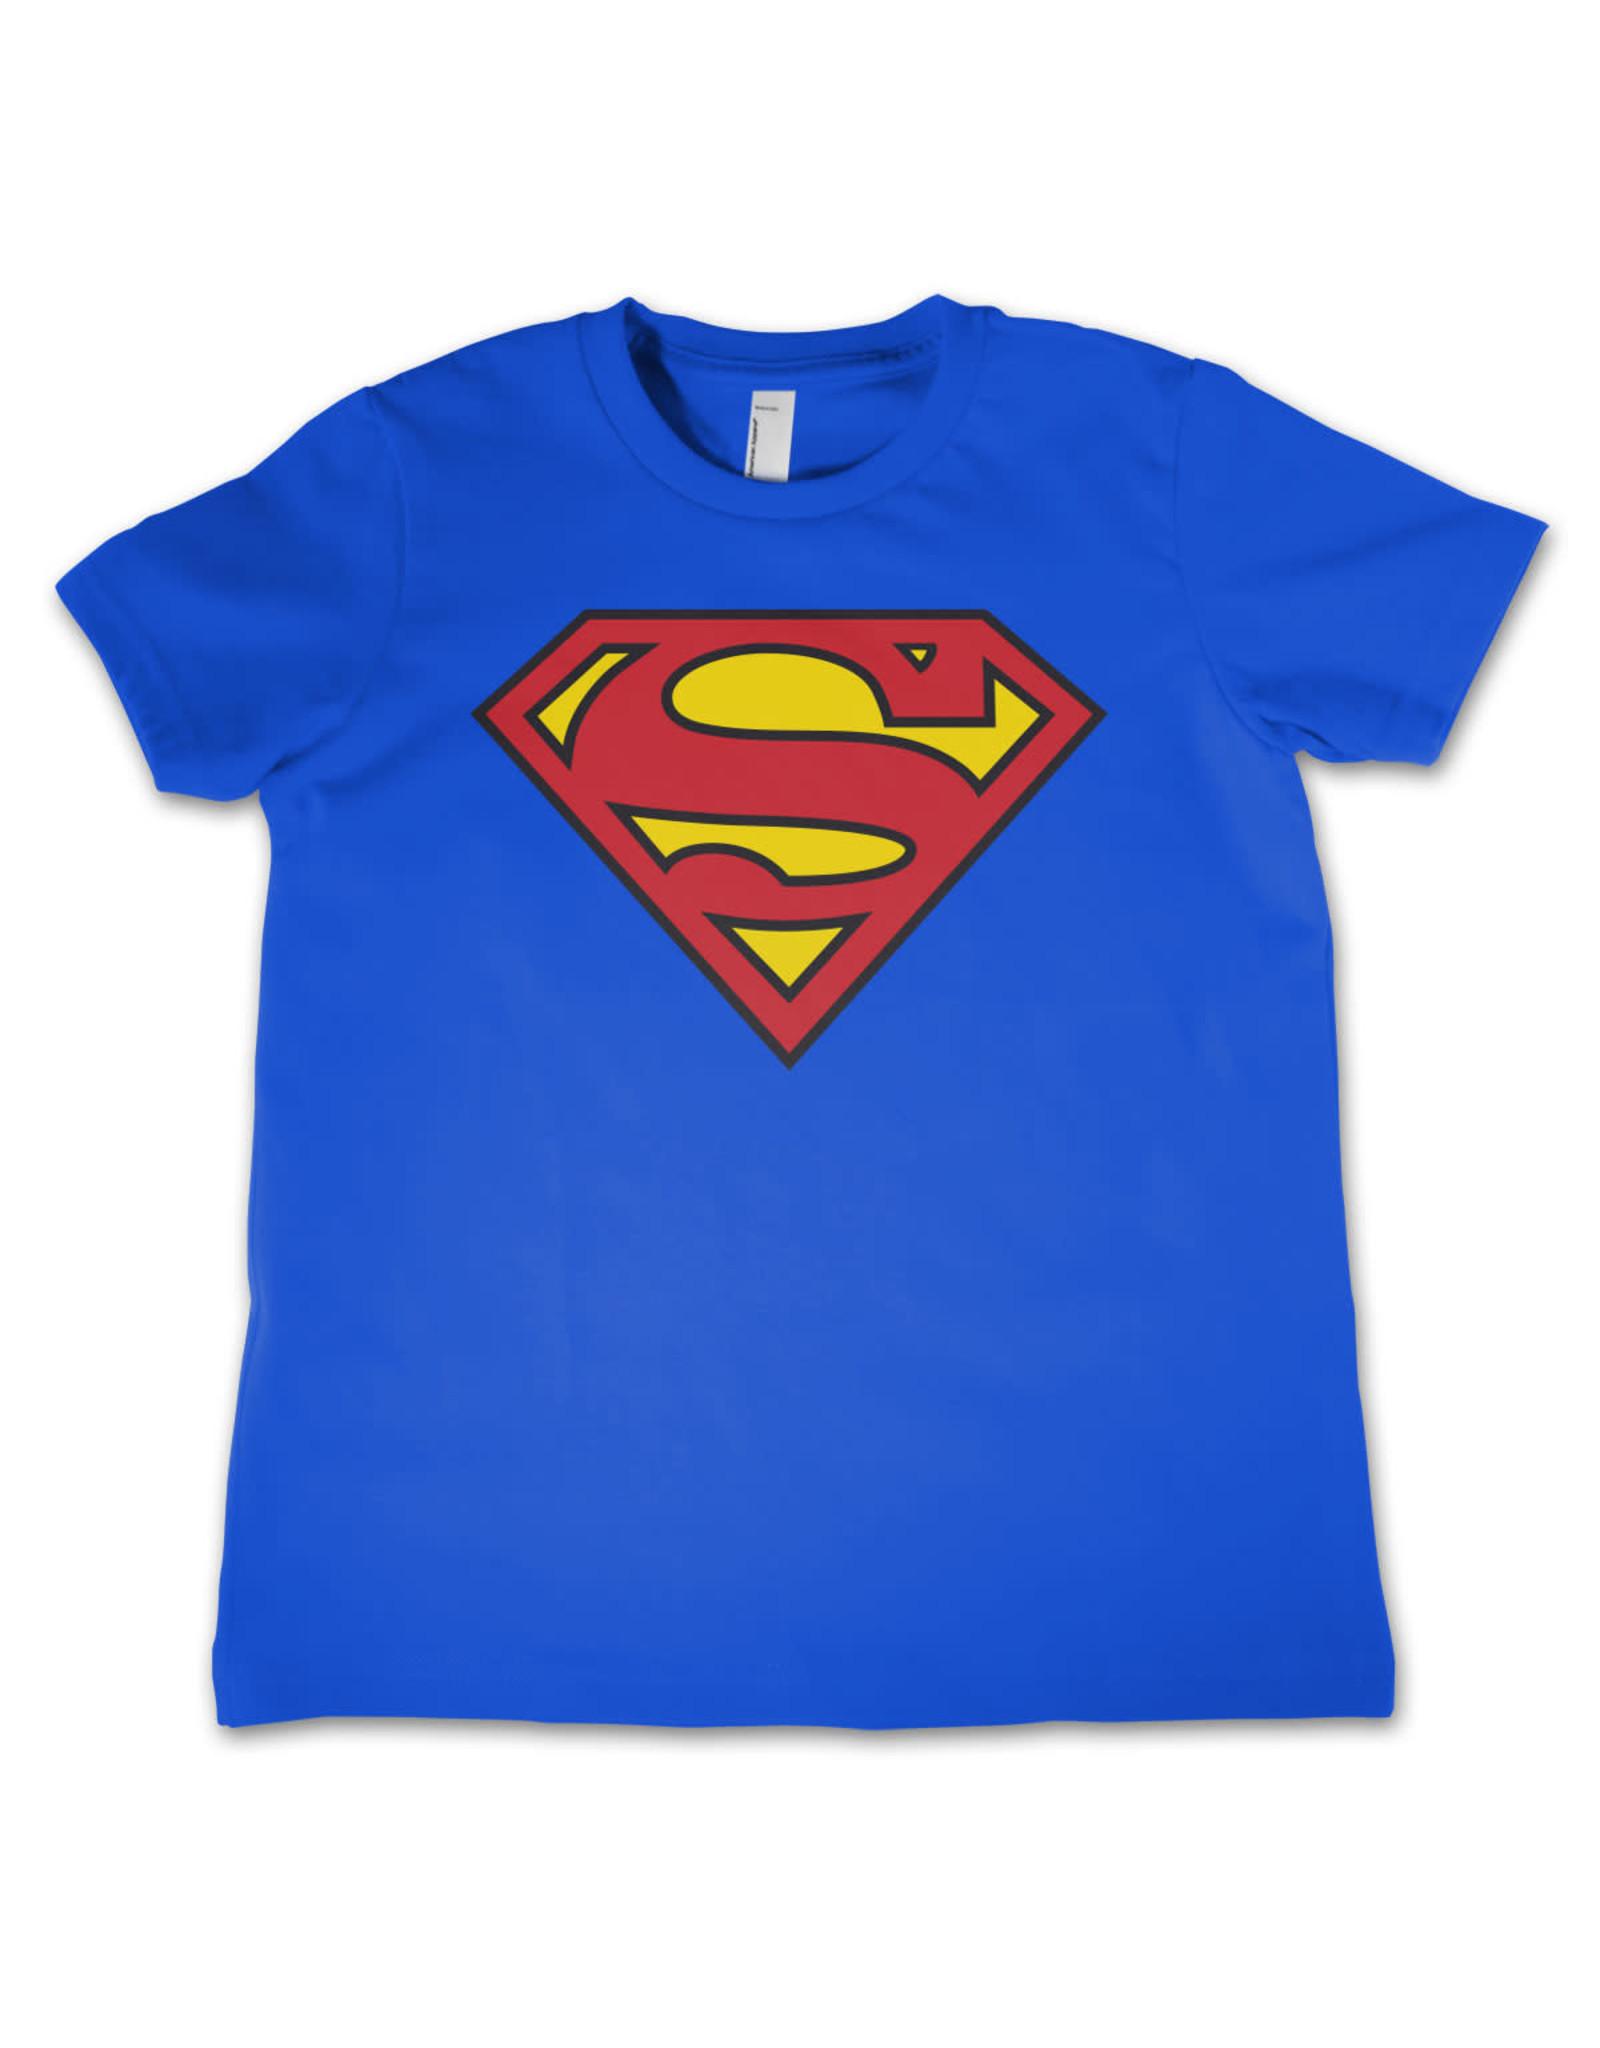 SUPERMAN - T-Shirt KIDS Shield Blue (6 Years)